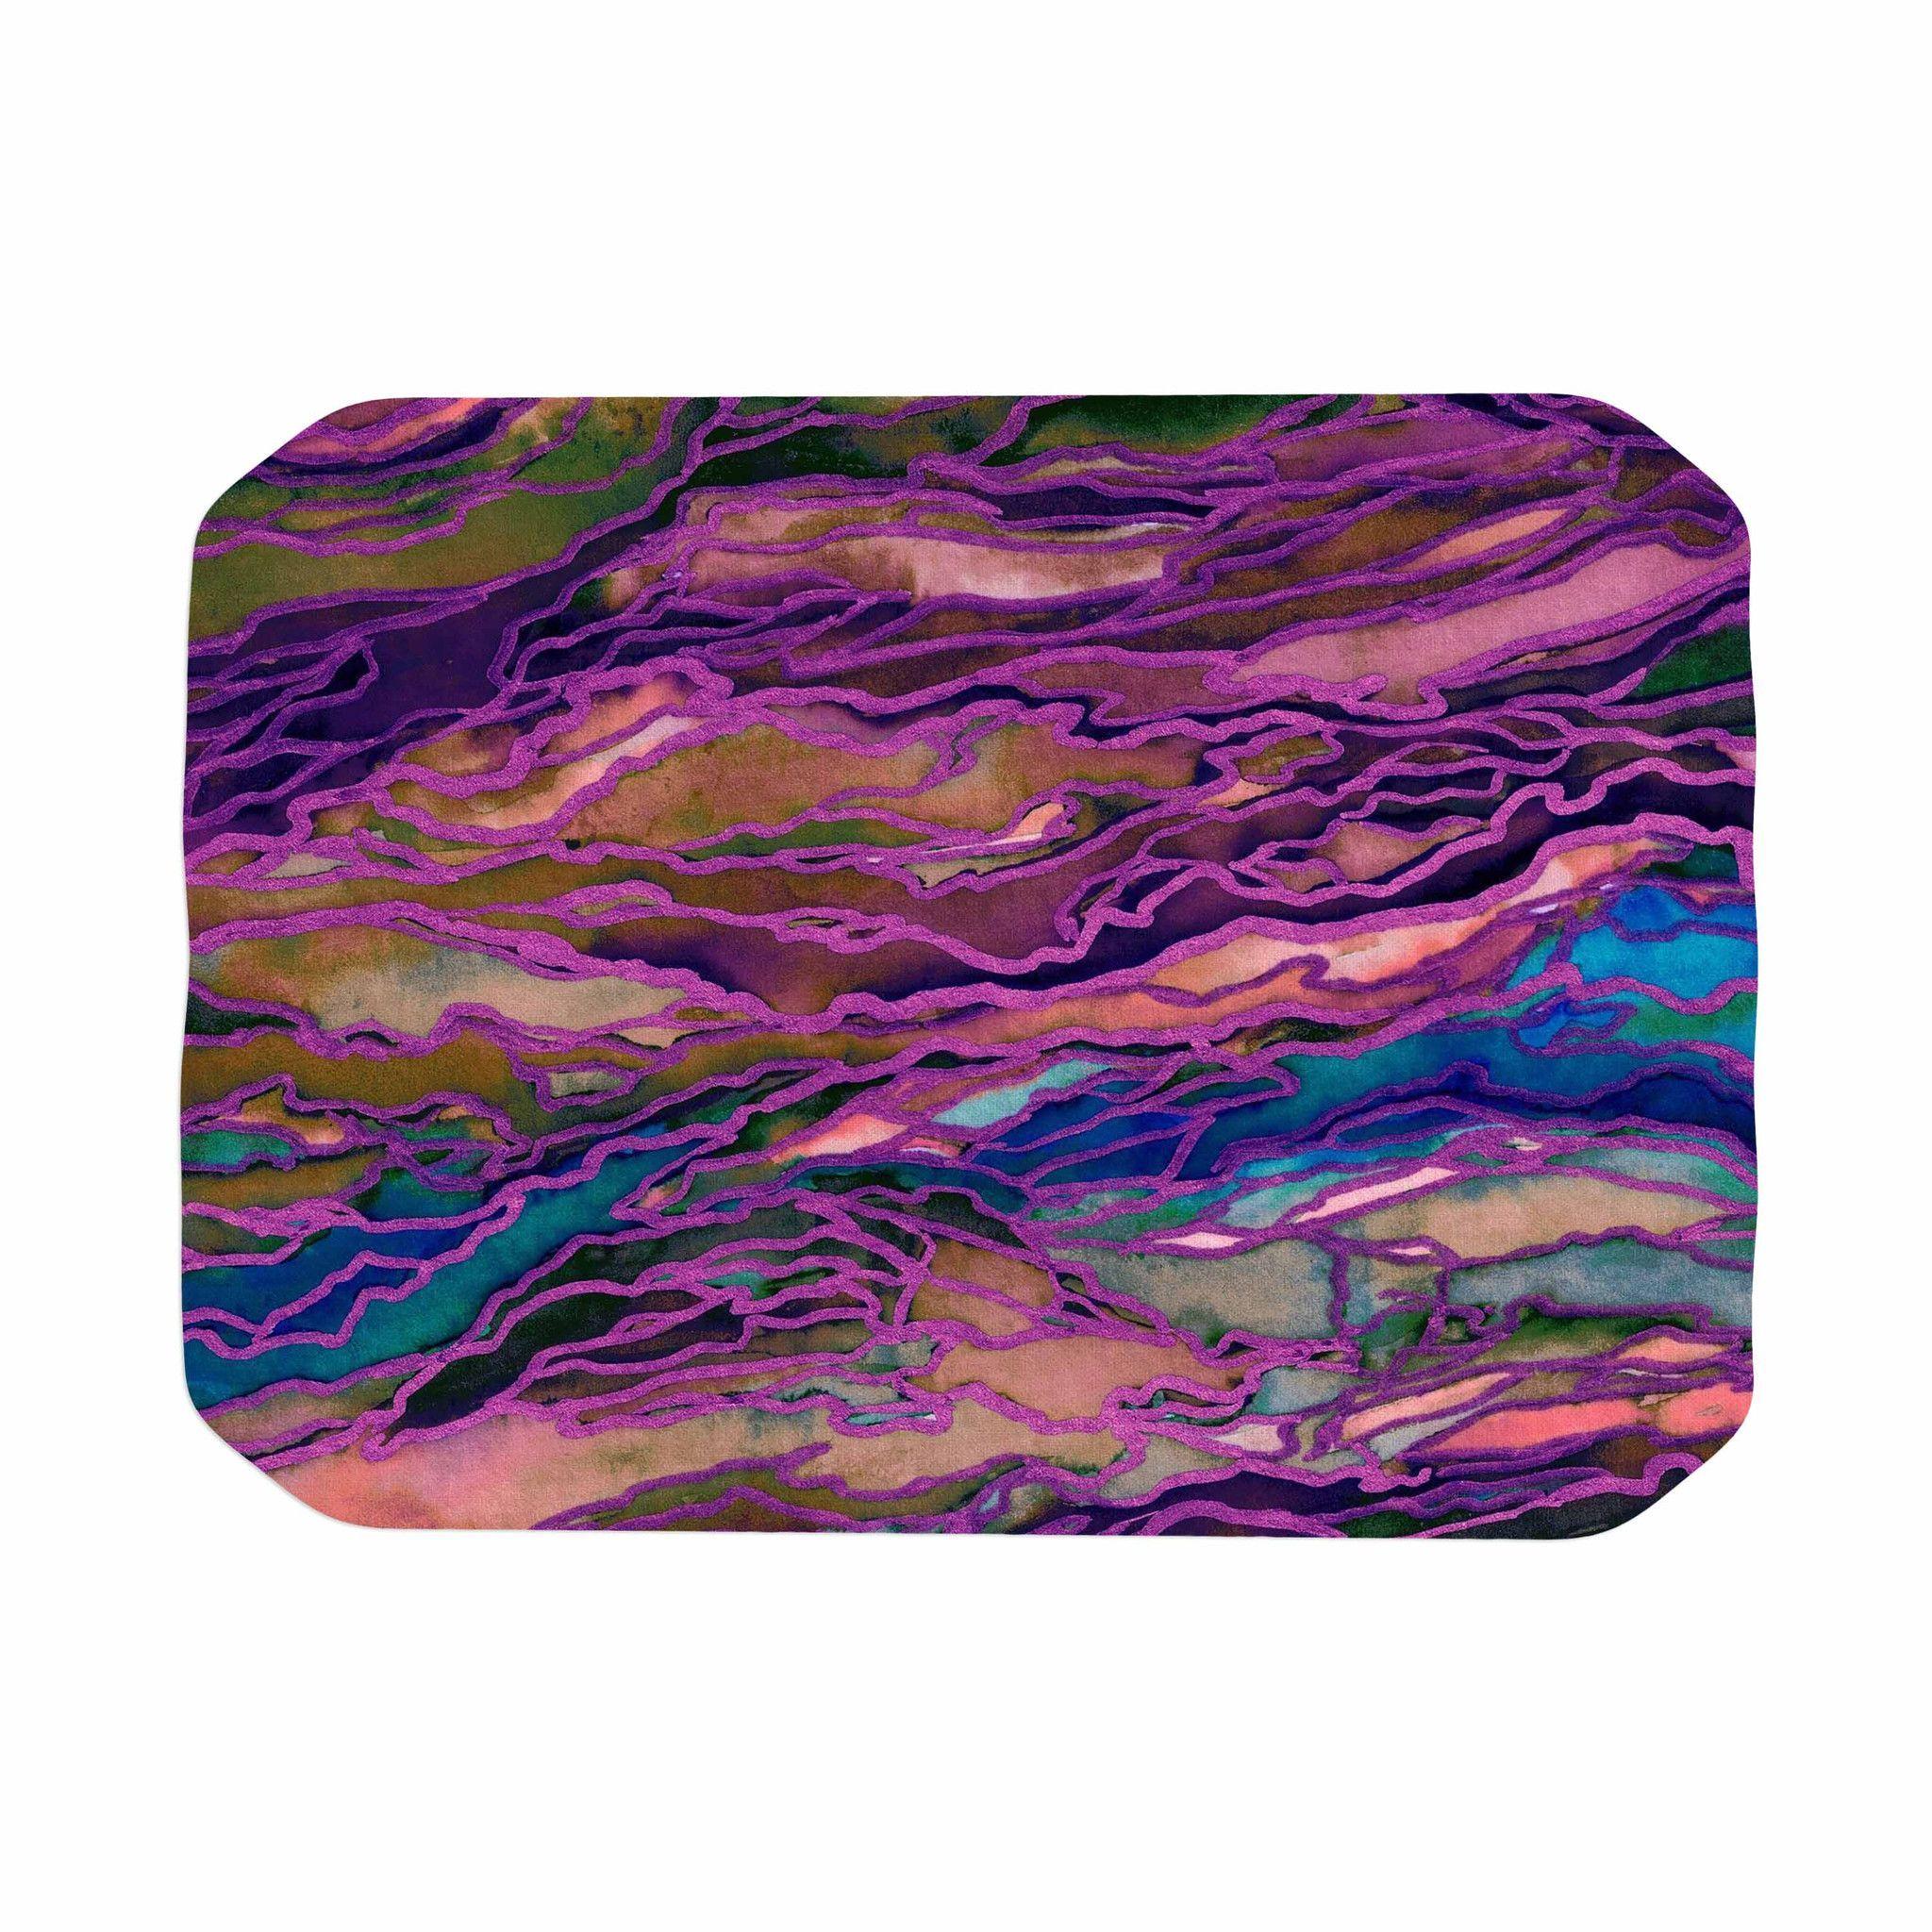 purple piece rug chenille chenillerugbabypink itm non mat bathroom carpet mats slip absorbant bath